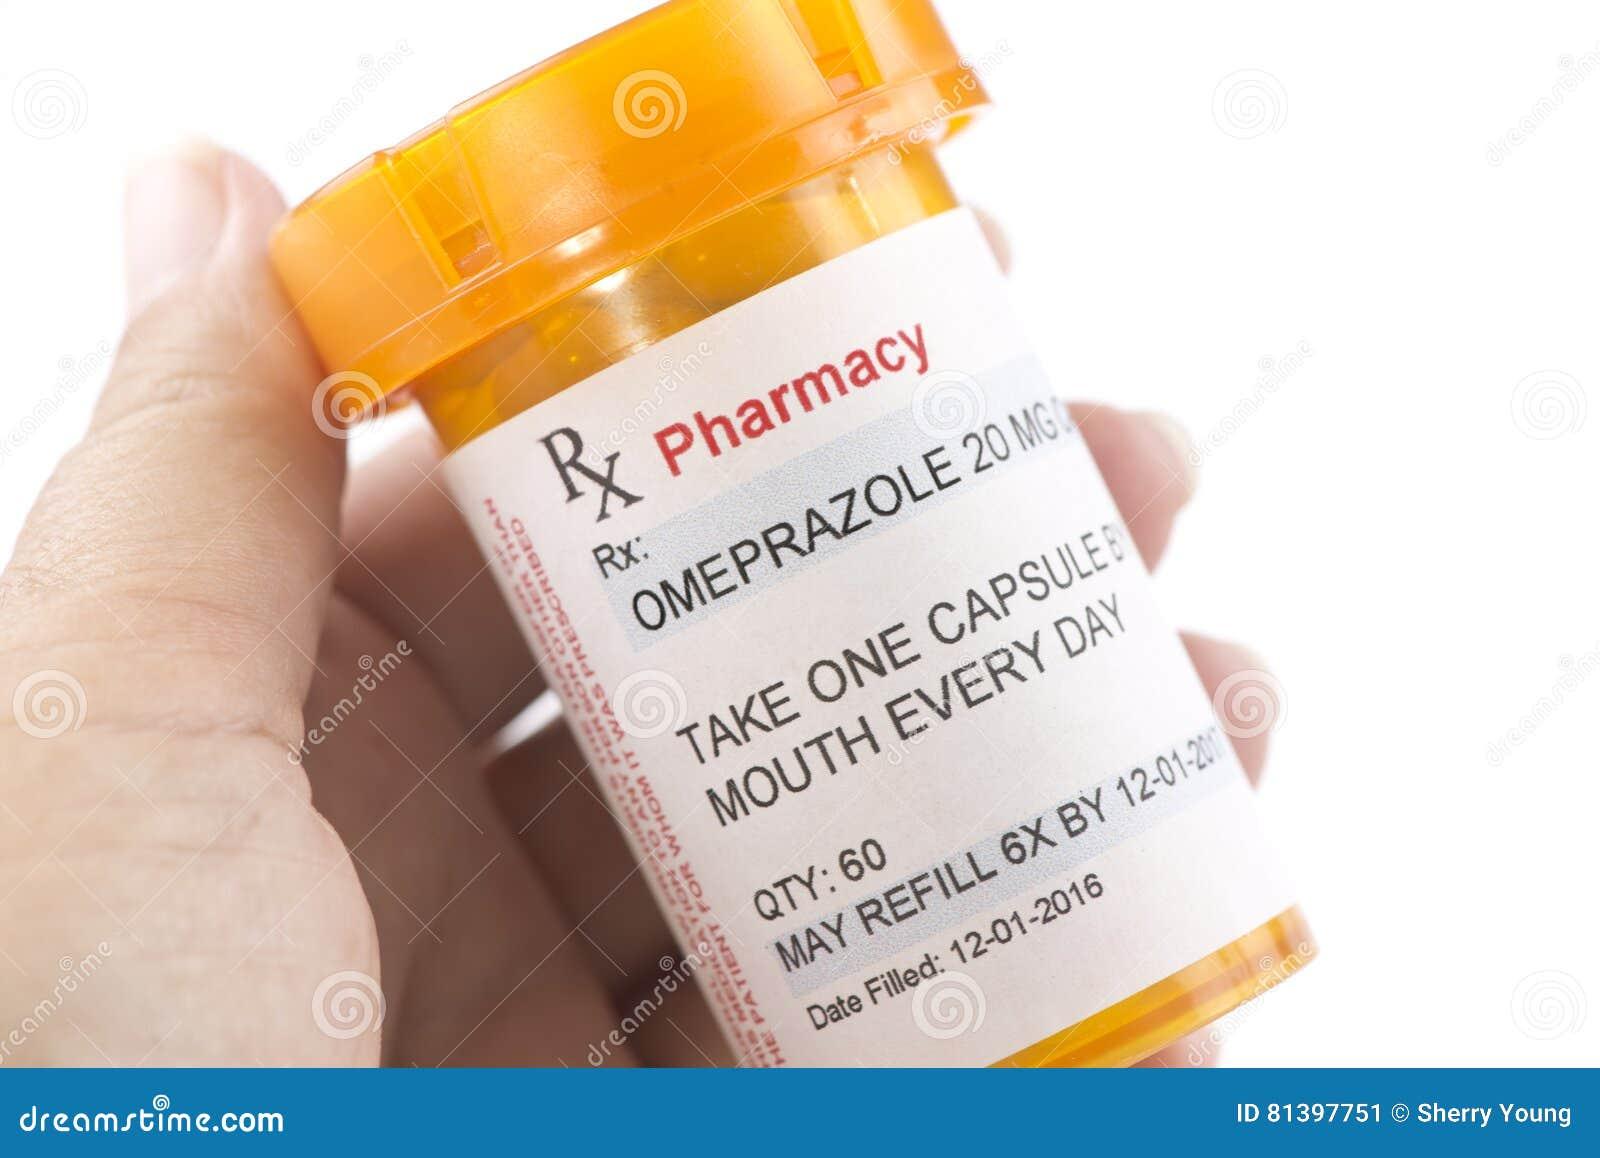 Omeprazole Side Effects Fatigue